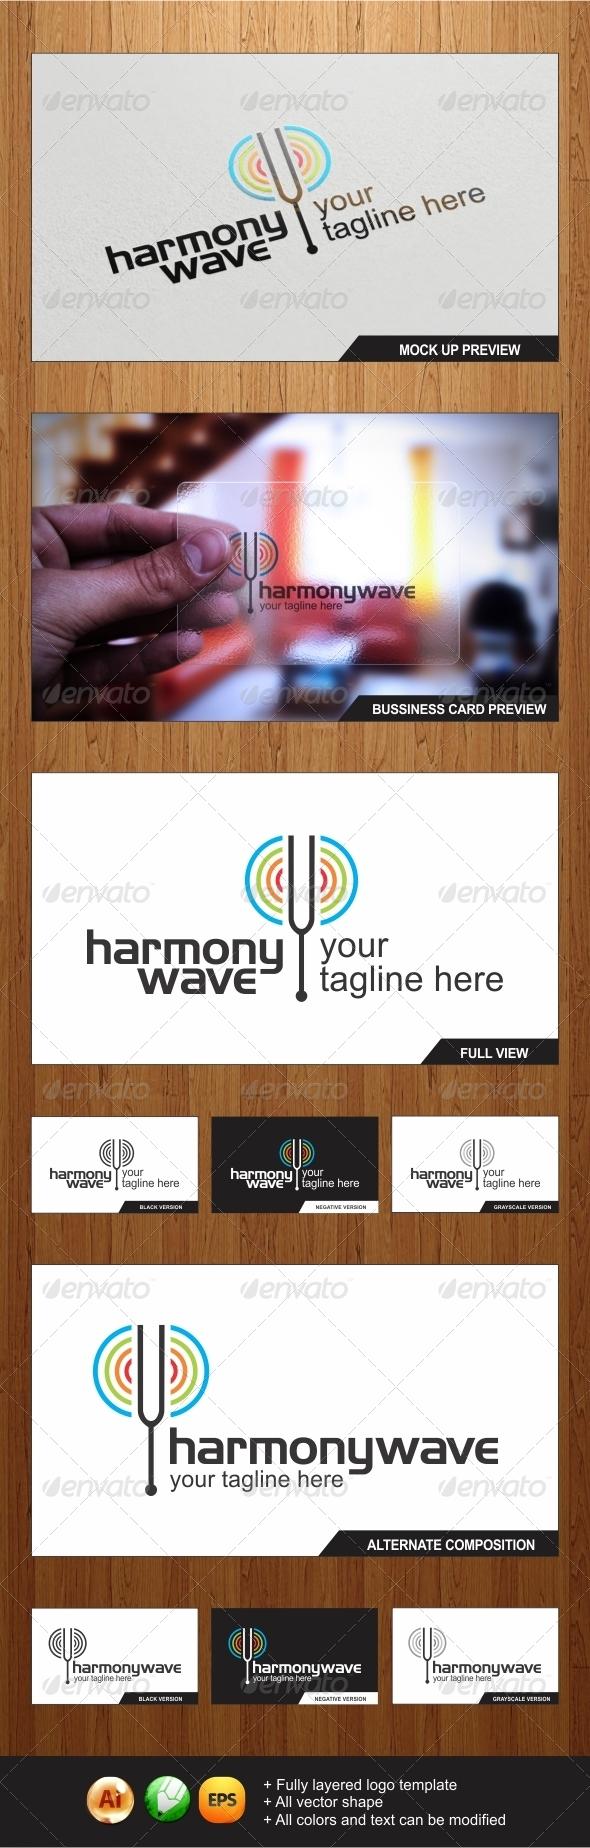 GraphicRiver Harmonywave Logo 4170115